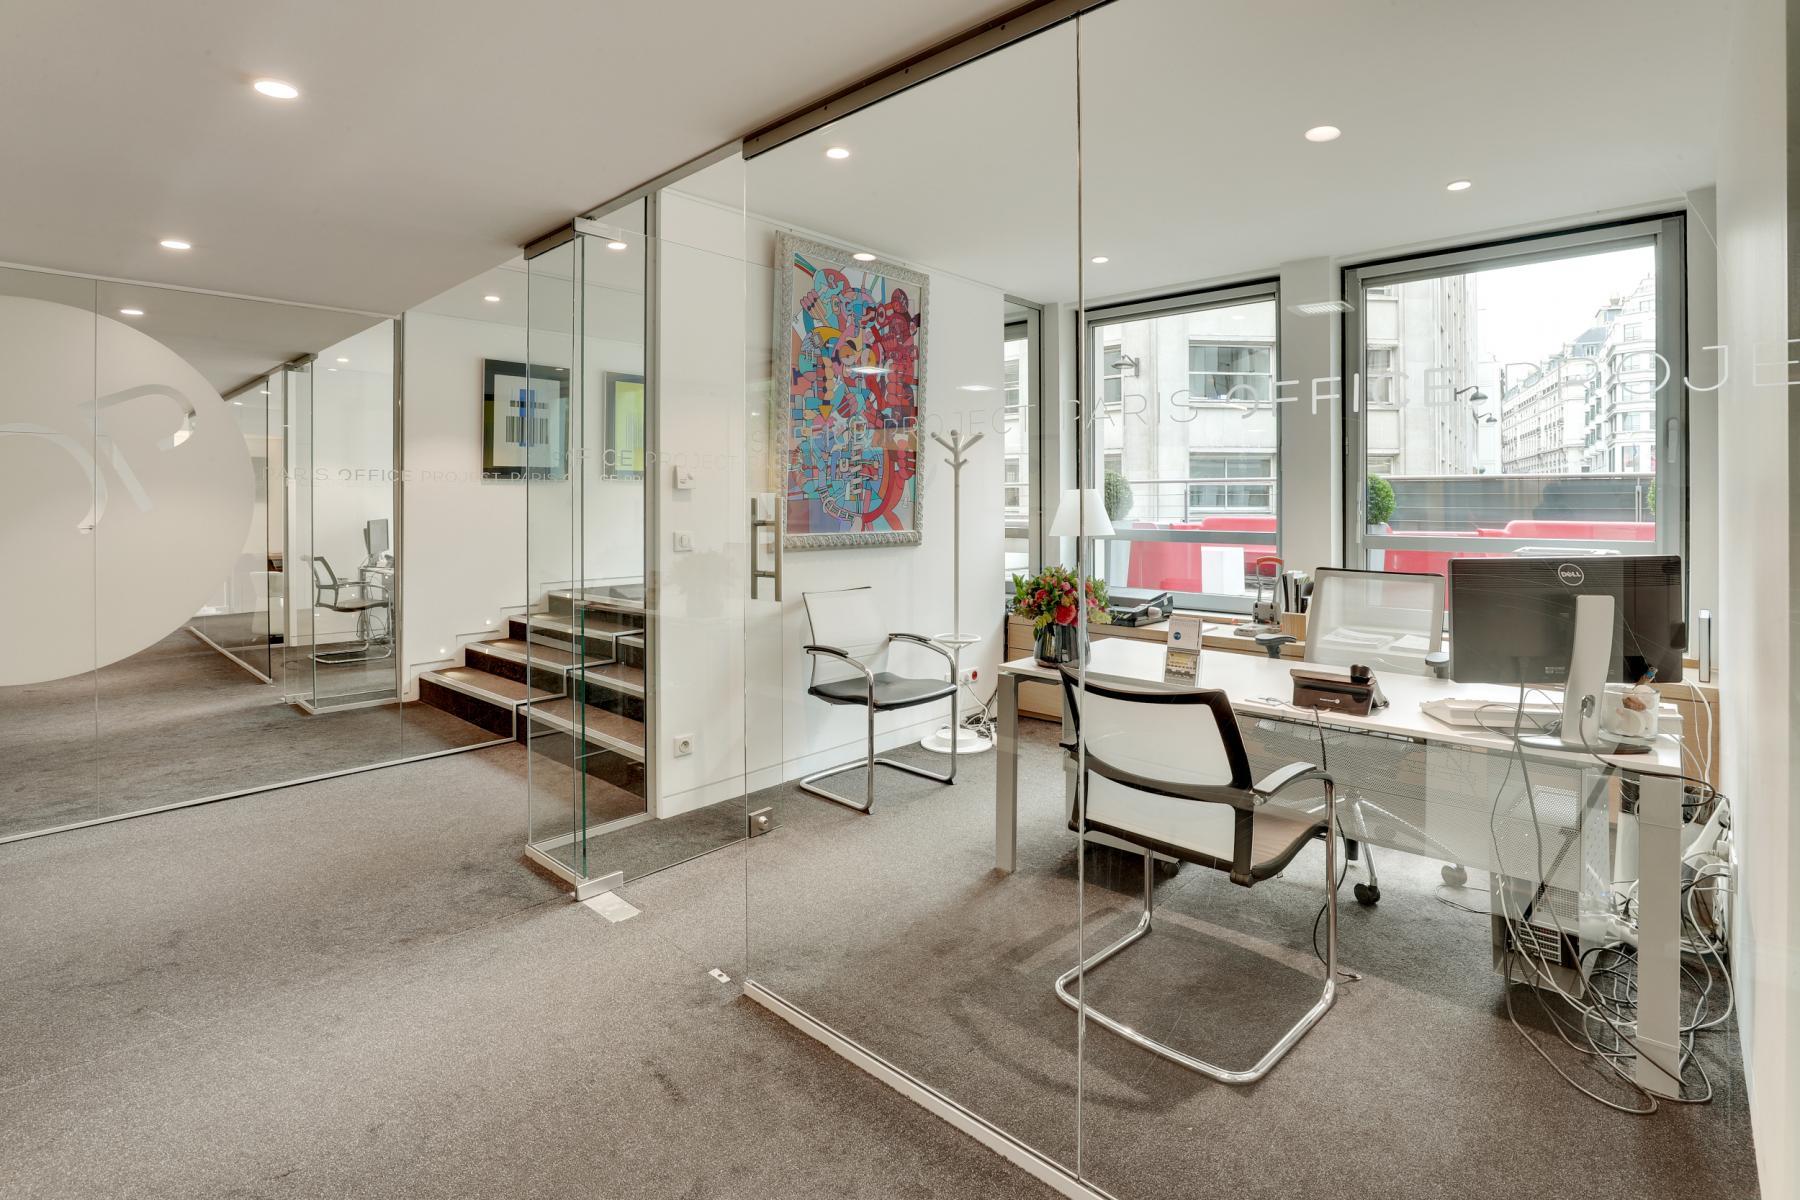 Location bureau Rue Quentin-Bauchart 20, Paris (14)